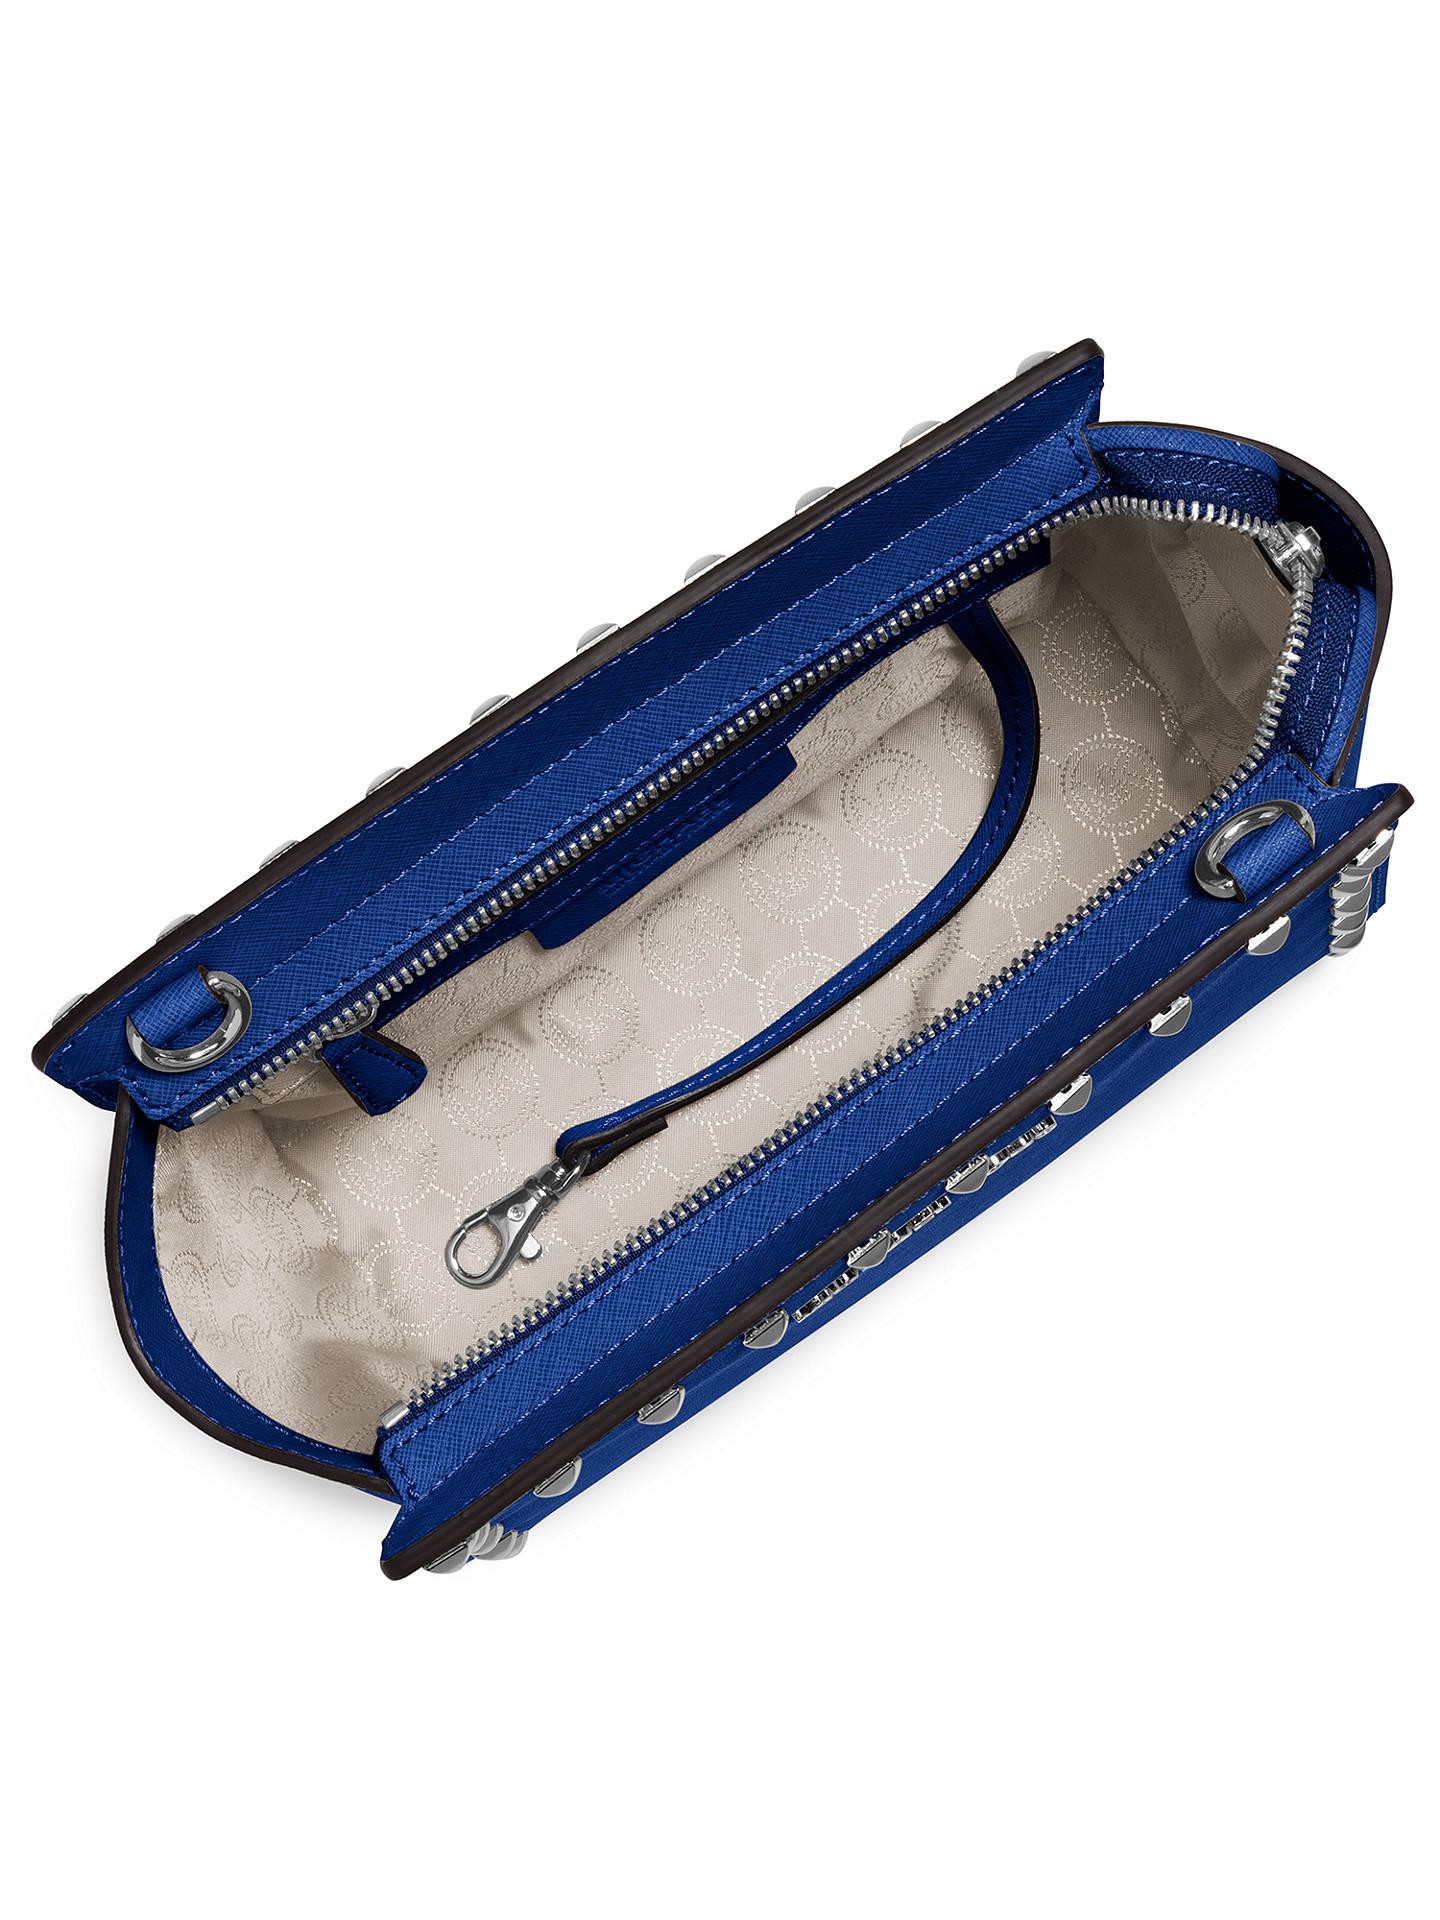 3b02478474873a Buy MICHAEL Michael Kors Selma Stud Medium Leather Messenger Bag, Blue  Online at johnlewis.